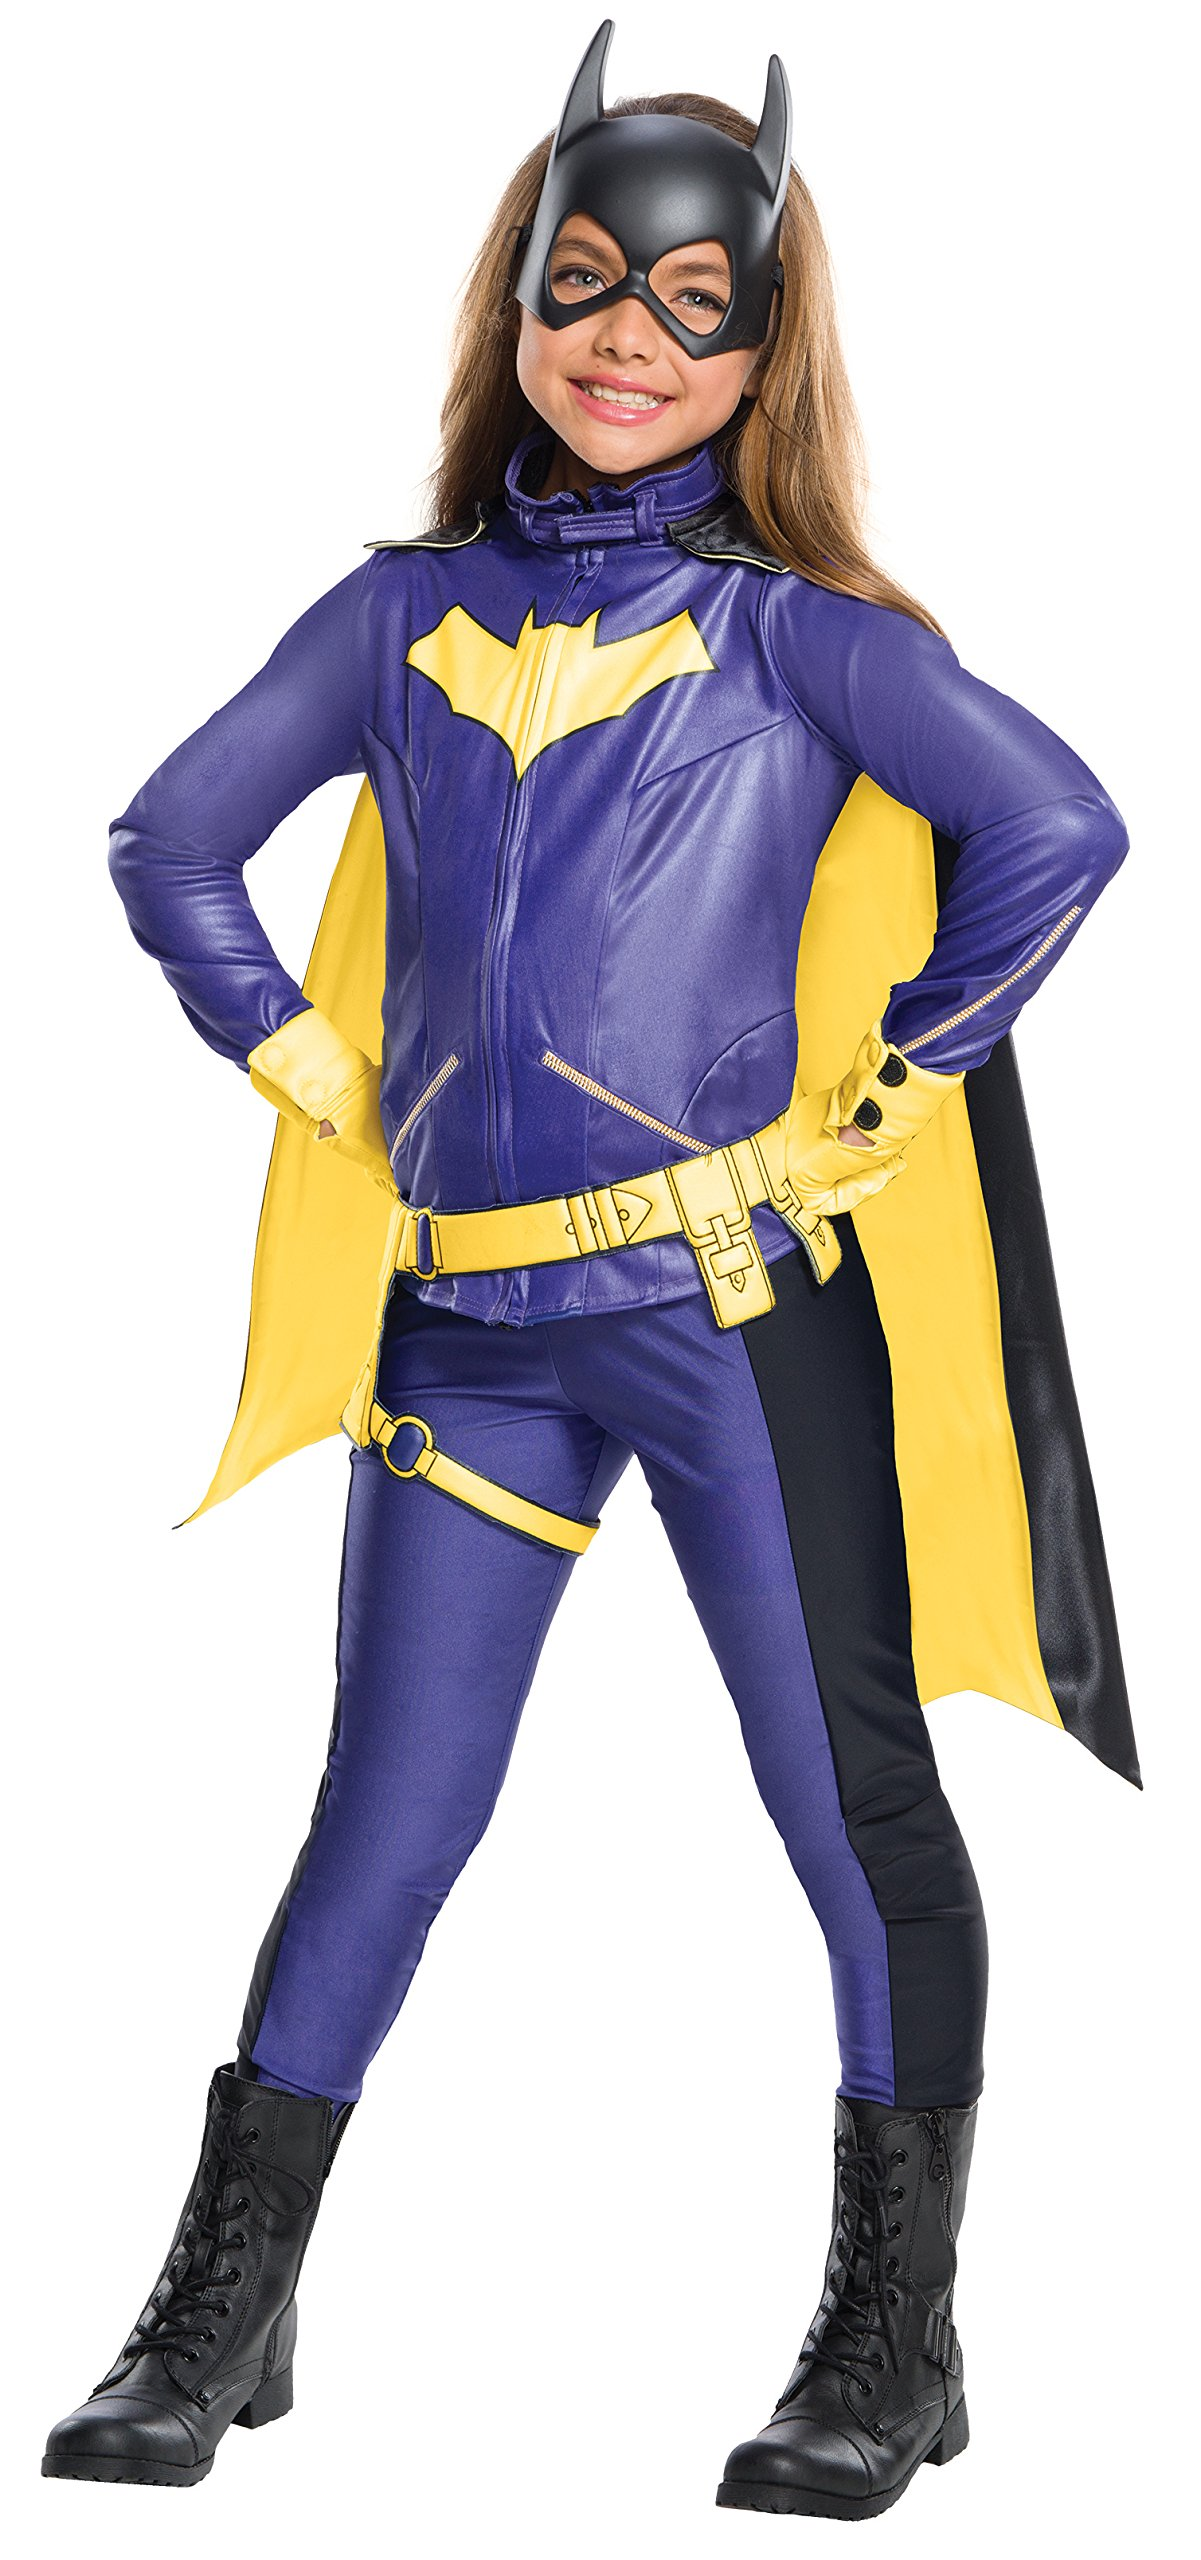 Rubie's Costume Girls DC Comics Premium Batgirl Costume, Large, Multicolor by Rubie's Costume